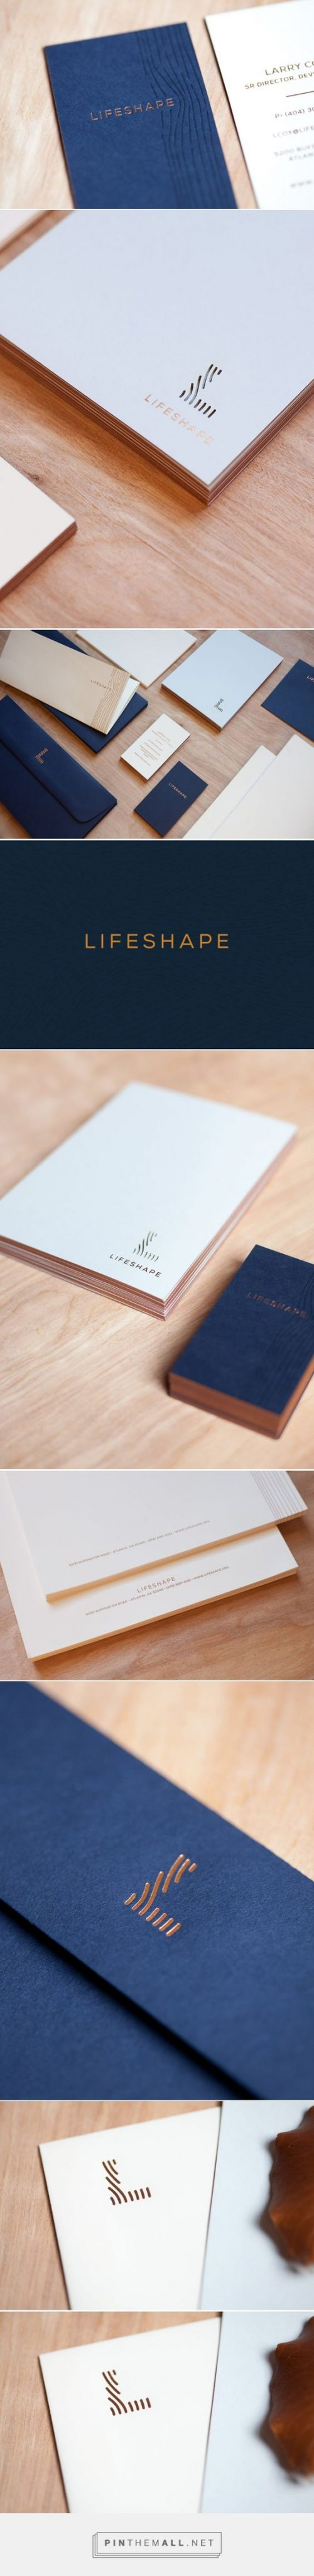 Lifeshape | Branding, Logo and Identity